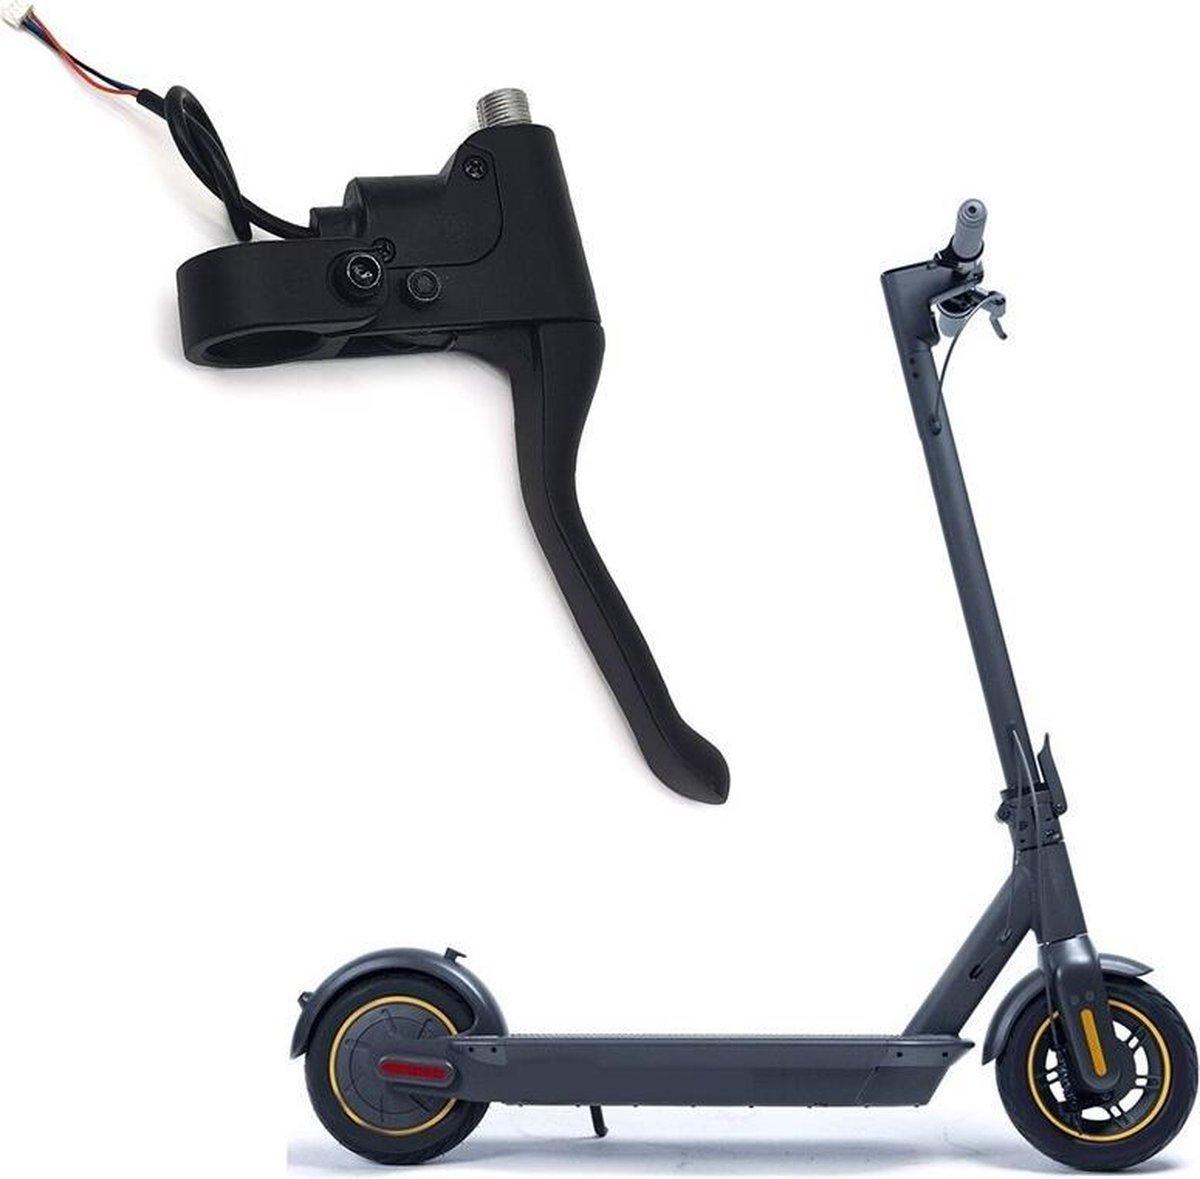 Remhendel segway ninebot g30 max elektrische step | Remkabel g30 max | rem voor segway ninebot g30 max elektrische step online kopen